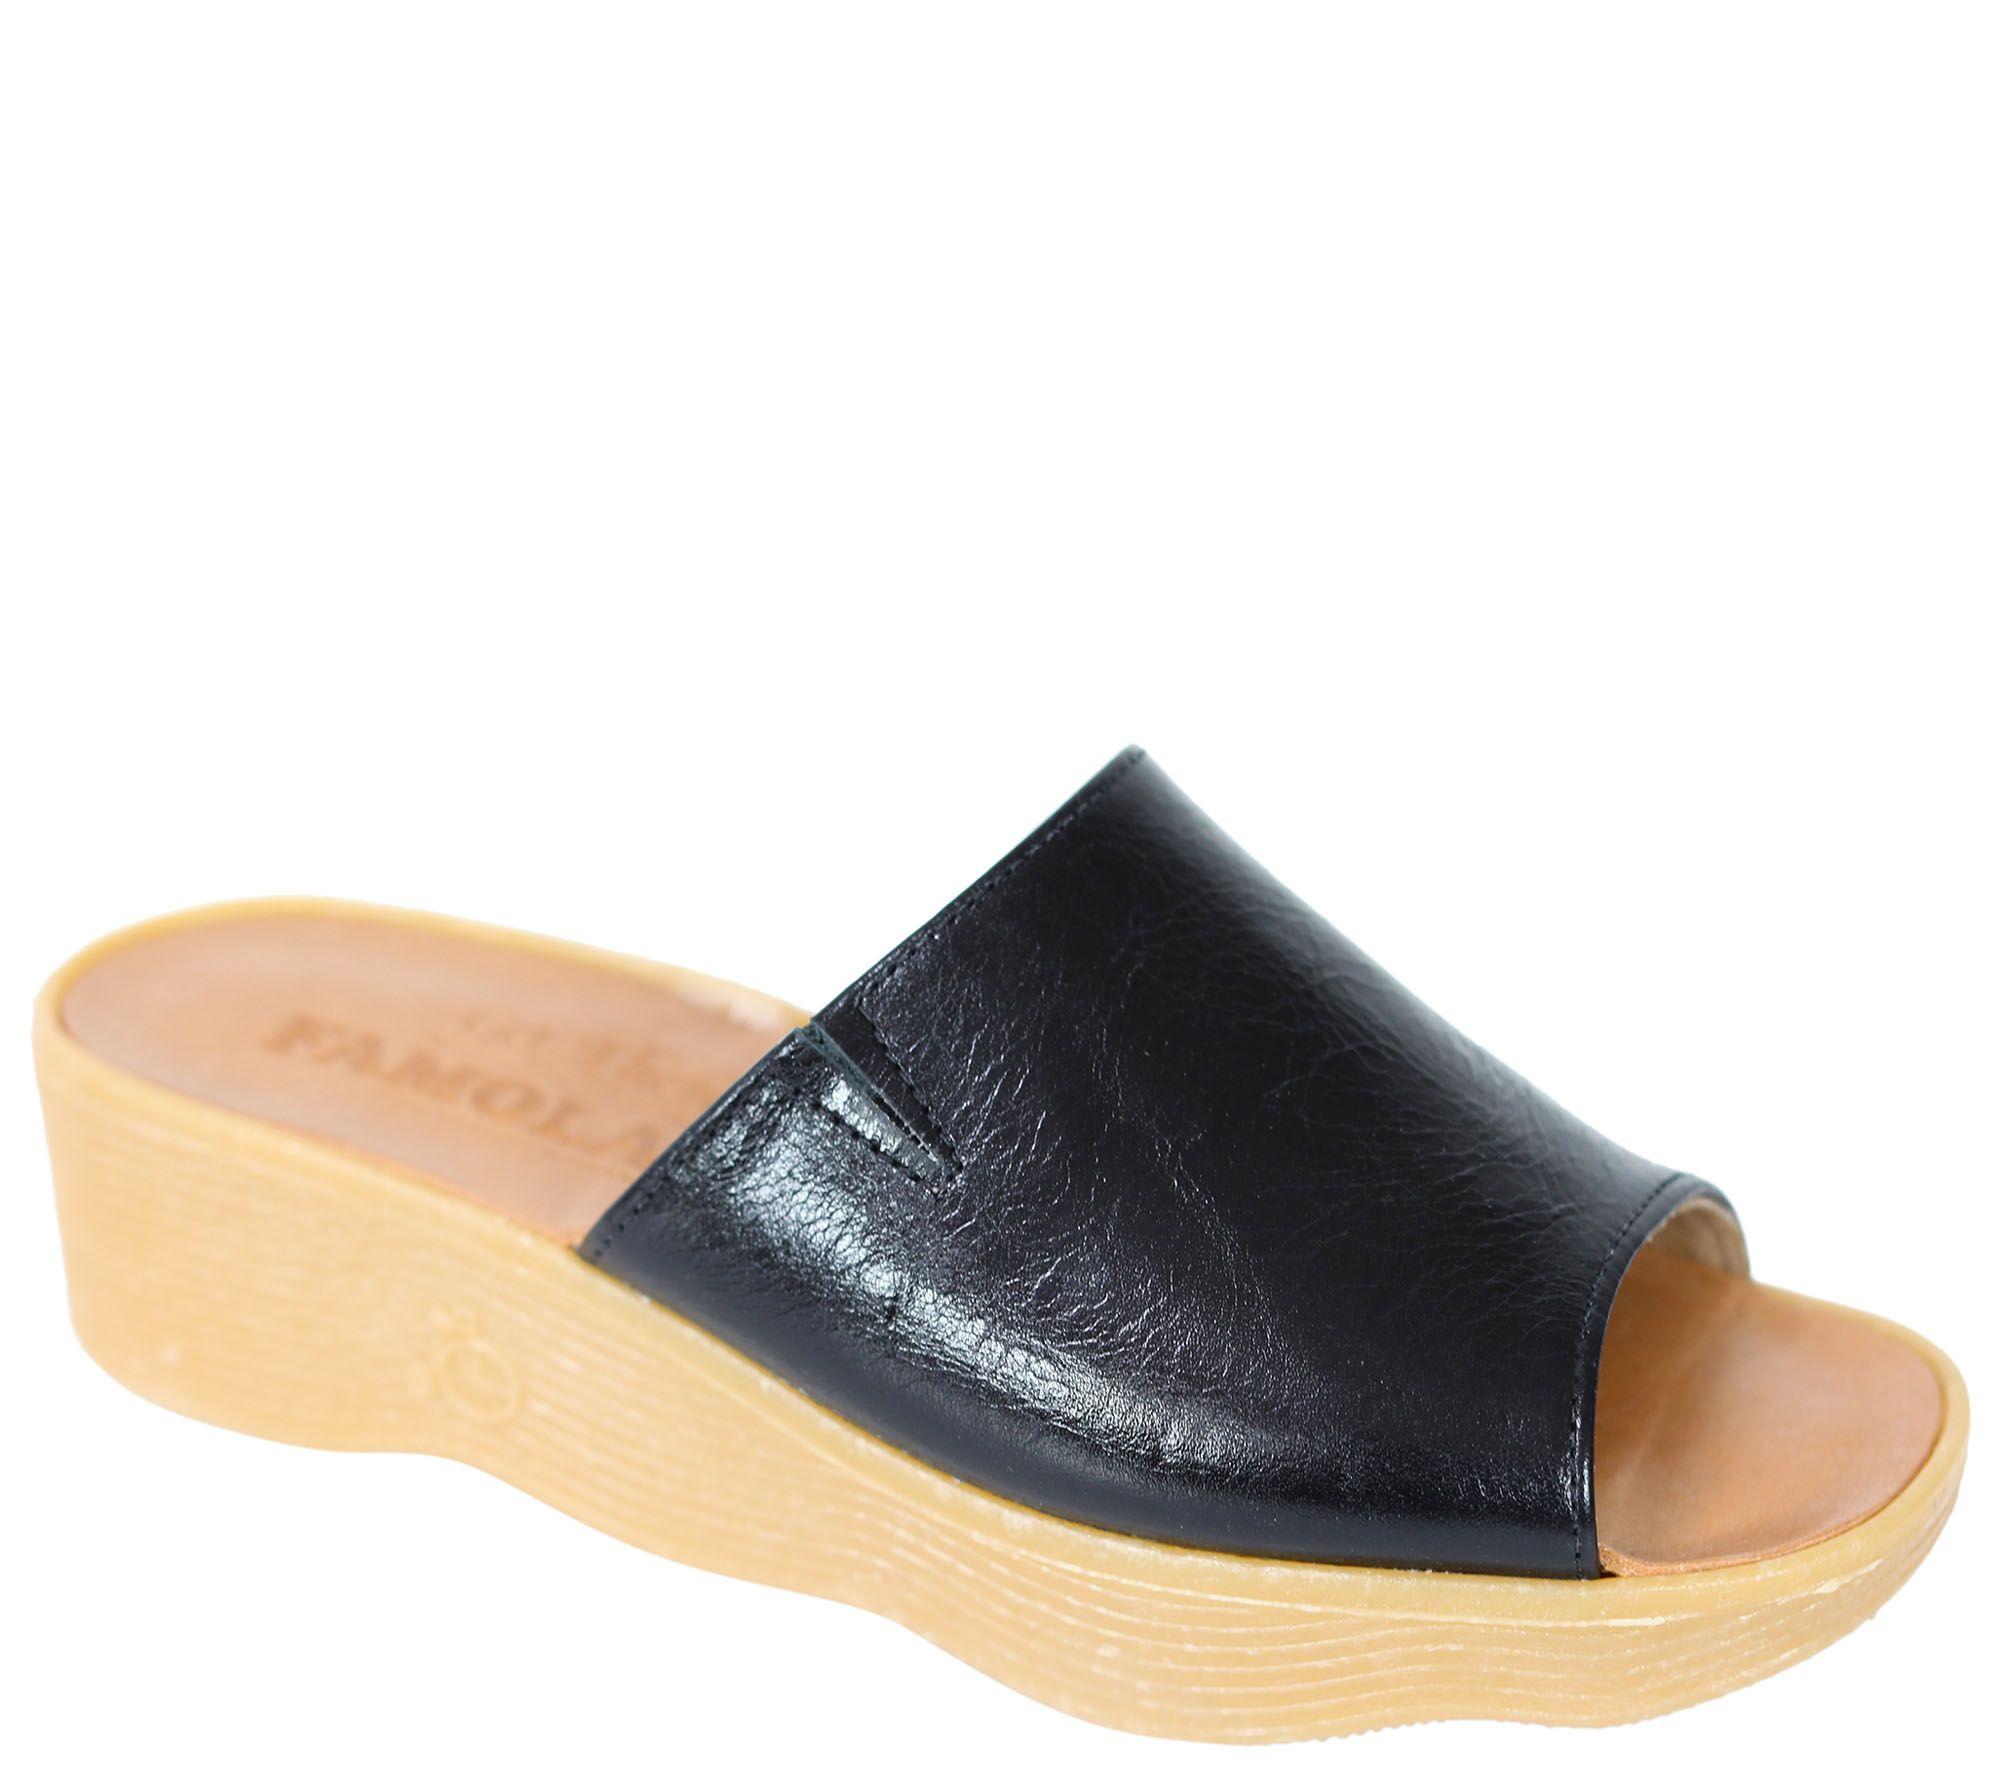 Leather Sliden Famolare Seek There Sandal Get Wedge jqLSzMGVpU